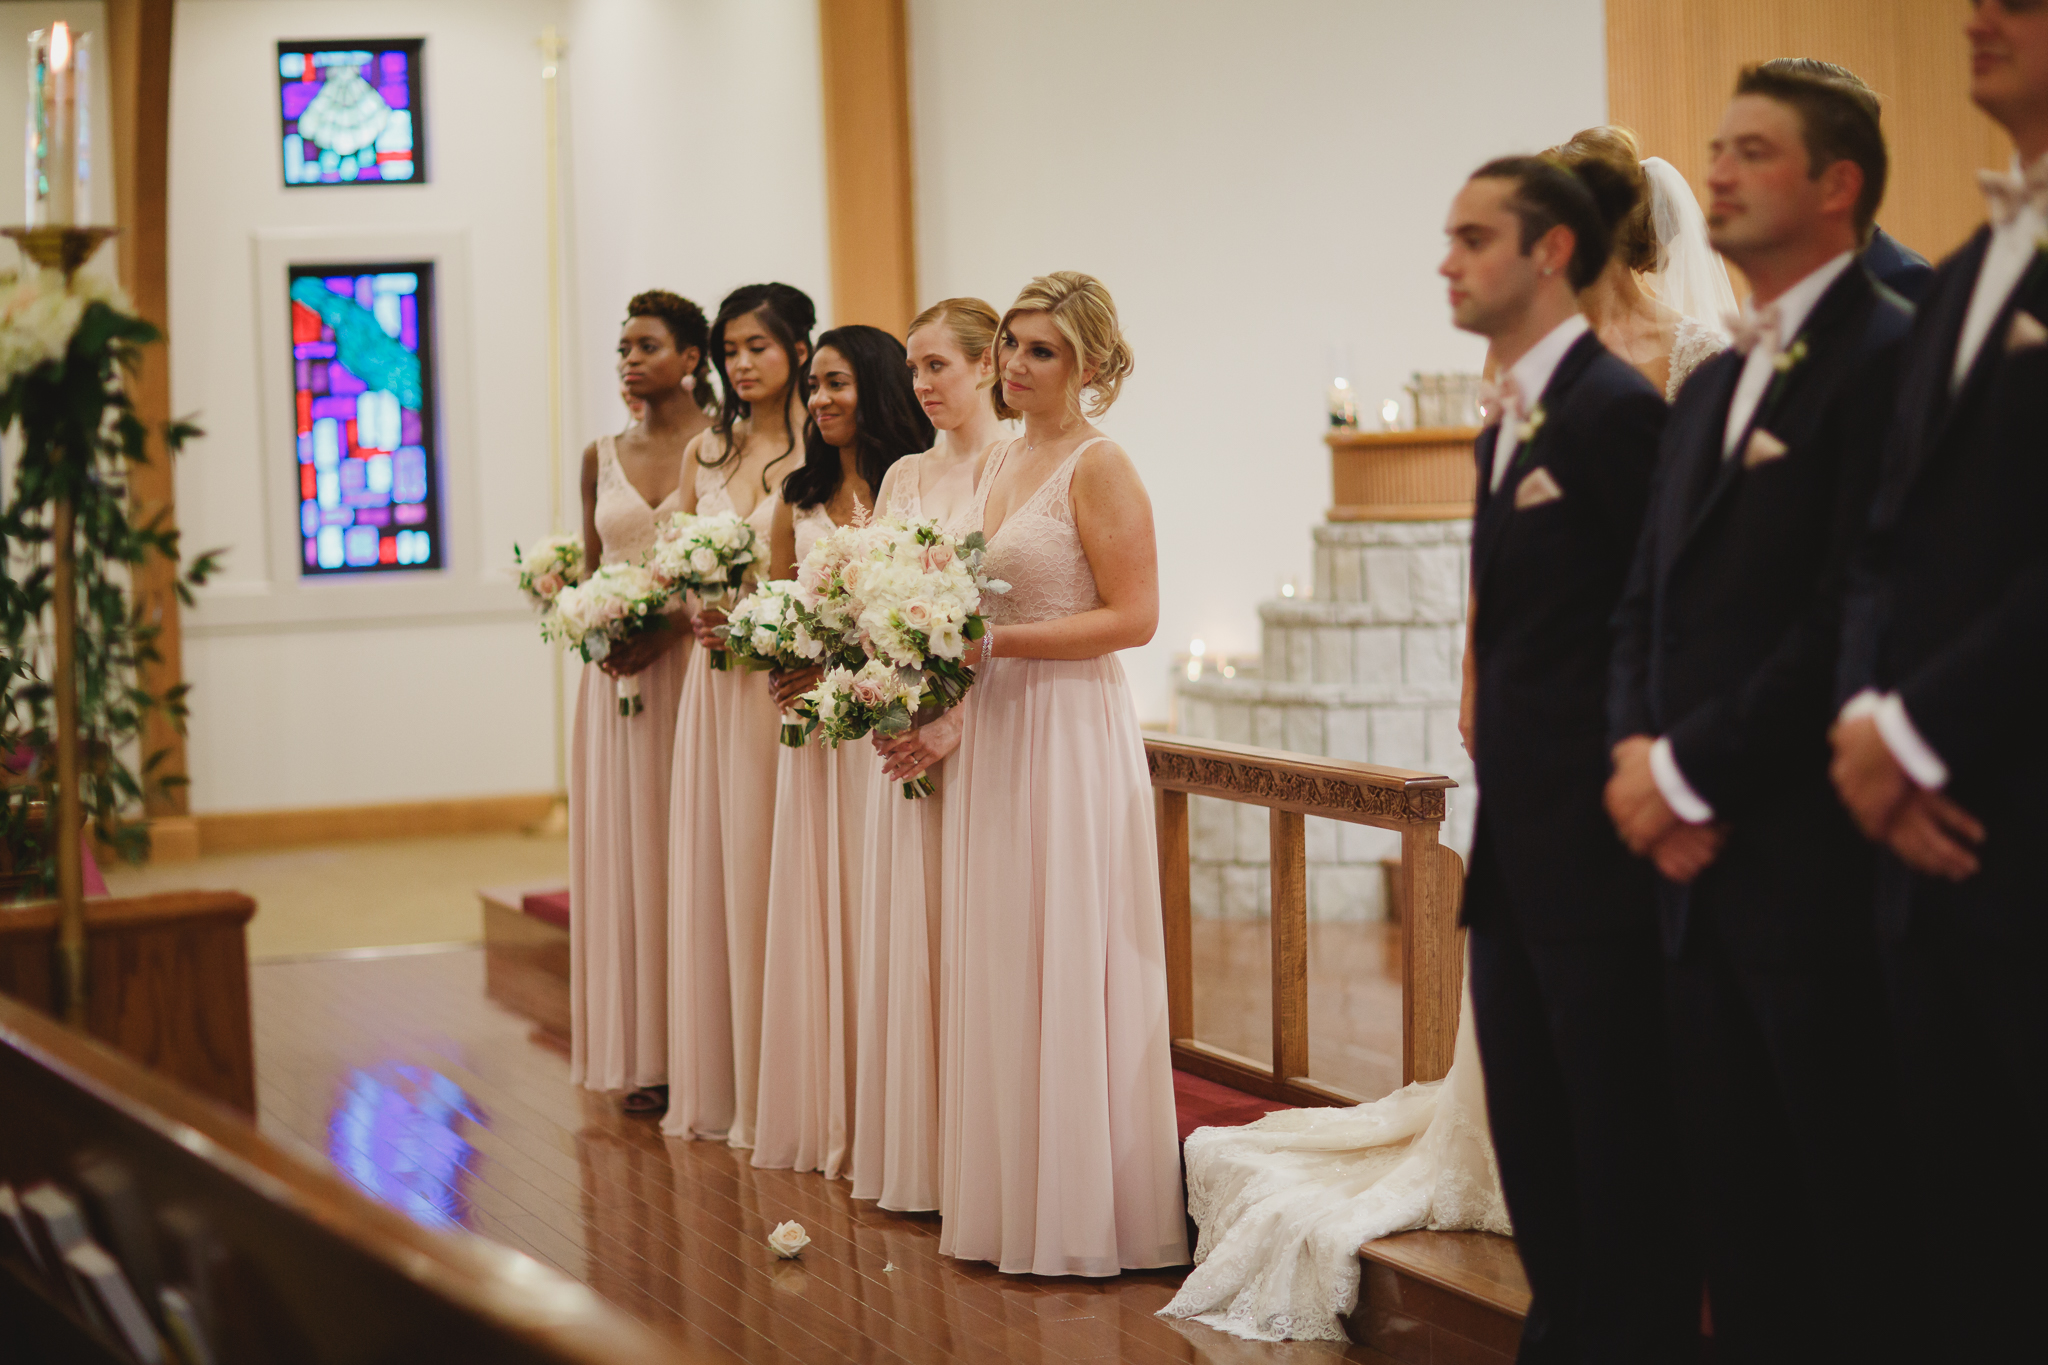 Michael and Kelly - the ashton depot - wedding DFW - wedding photographer- elizalde photography (41 of 150).jpg